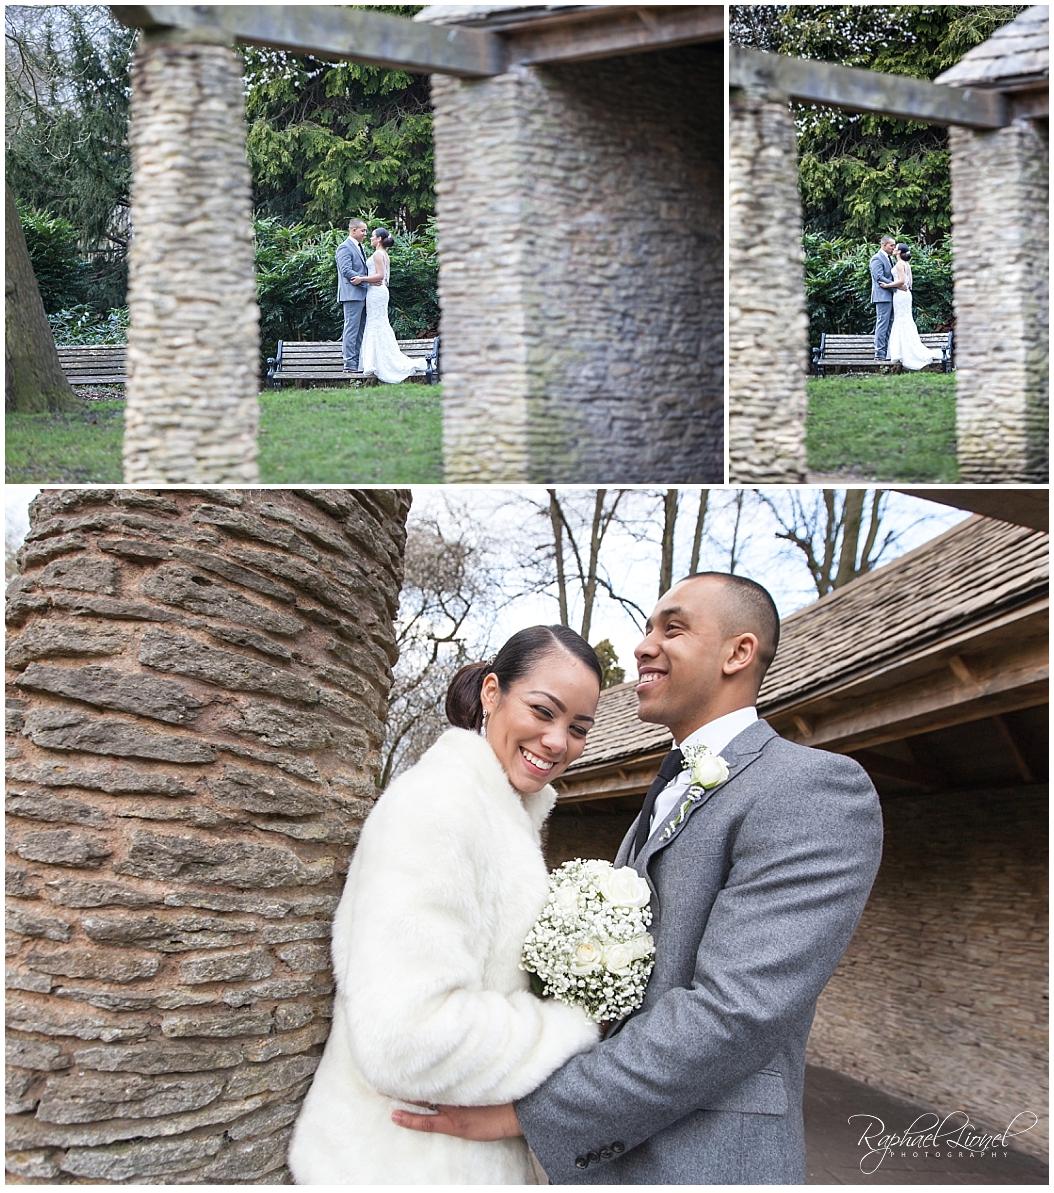 ShanNathnael24 - Nathanael and Shanice's Winter Wedding